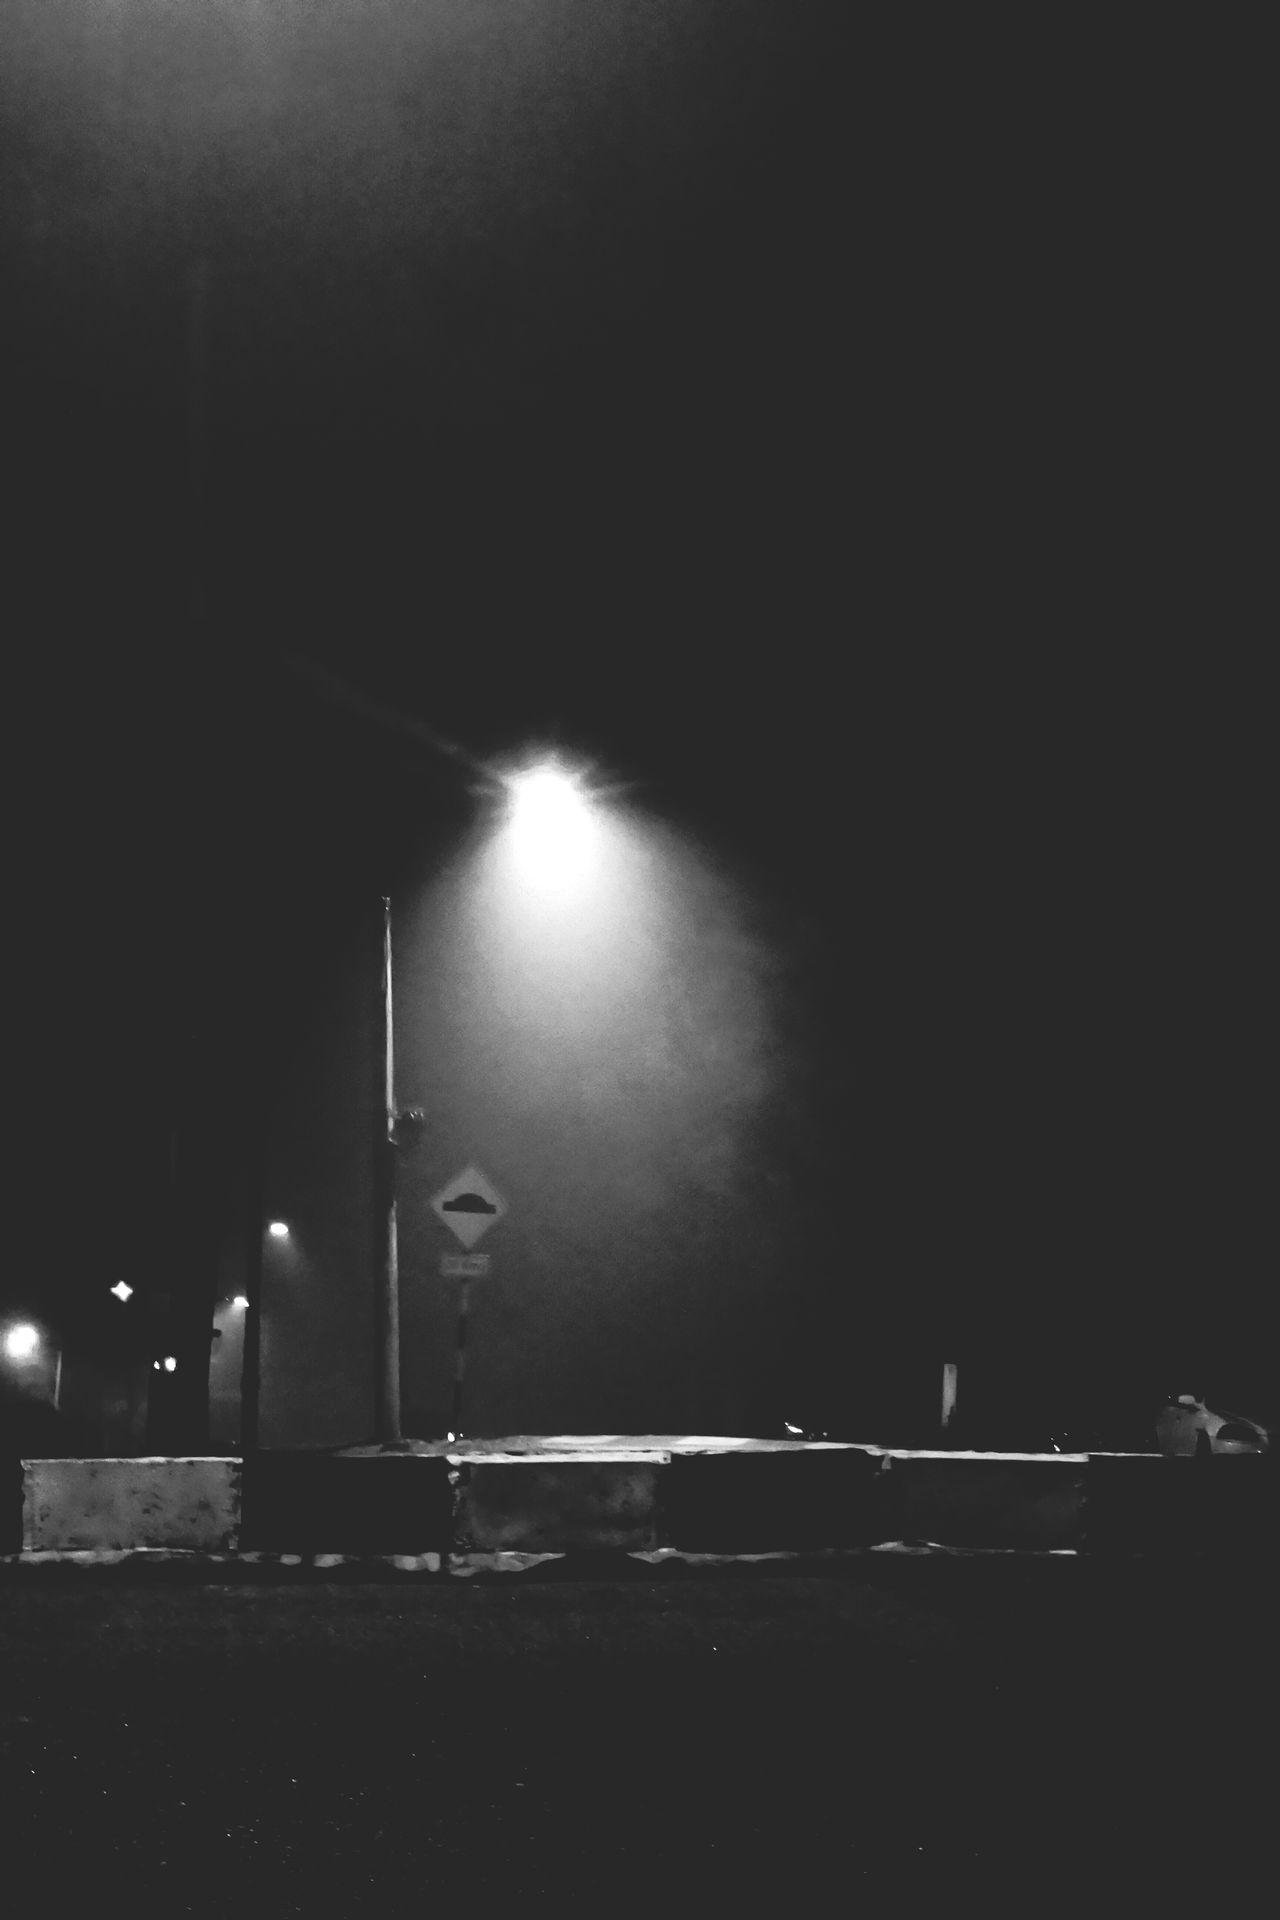 Night Outdoors No People Sky Signboard Streetphotography Photography Blackandwhite Haze Weather